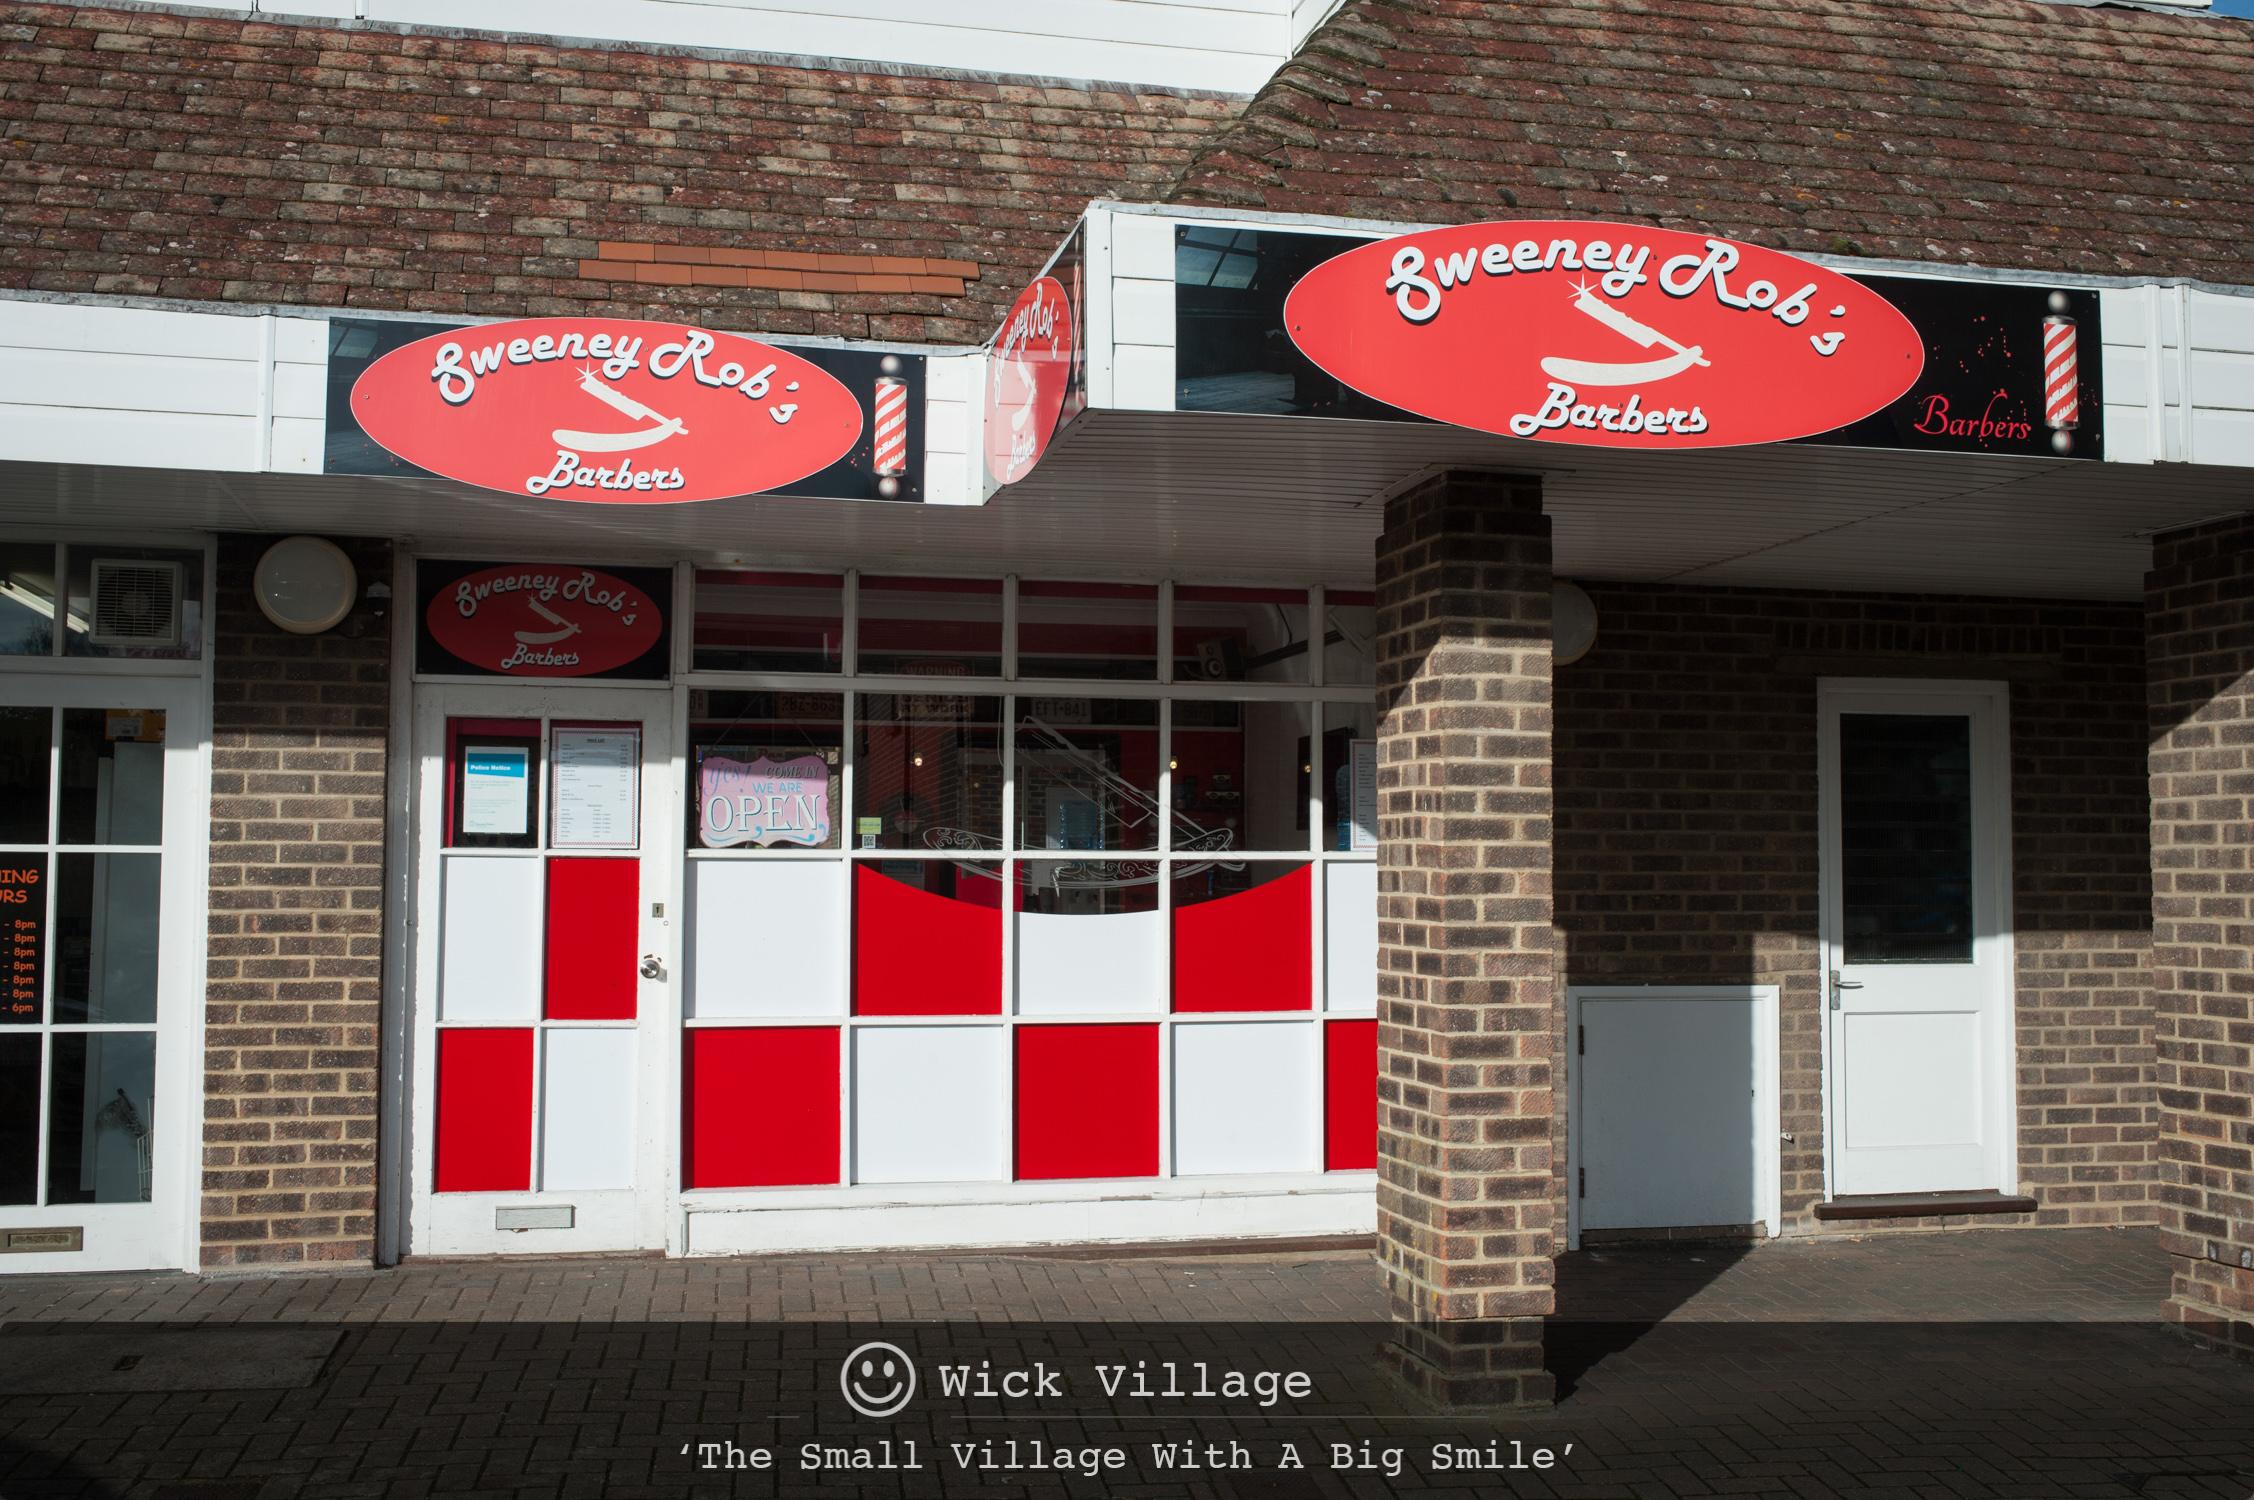 Sweeney Rob's Barbers, Wick Village, Littlehampton.